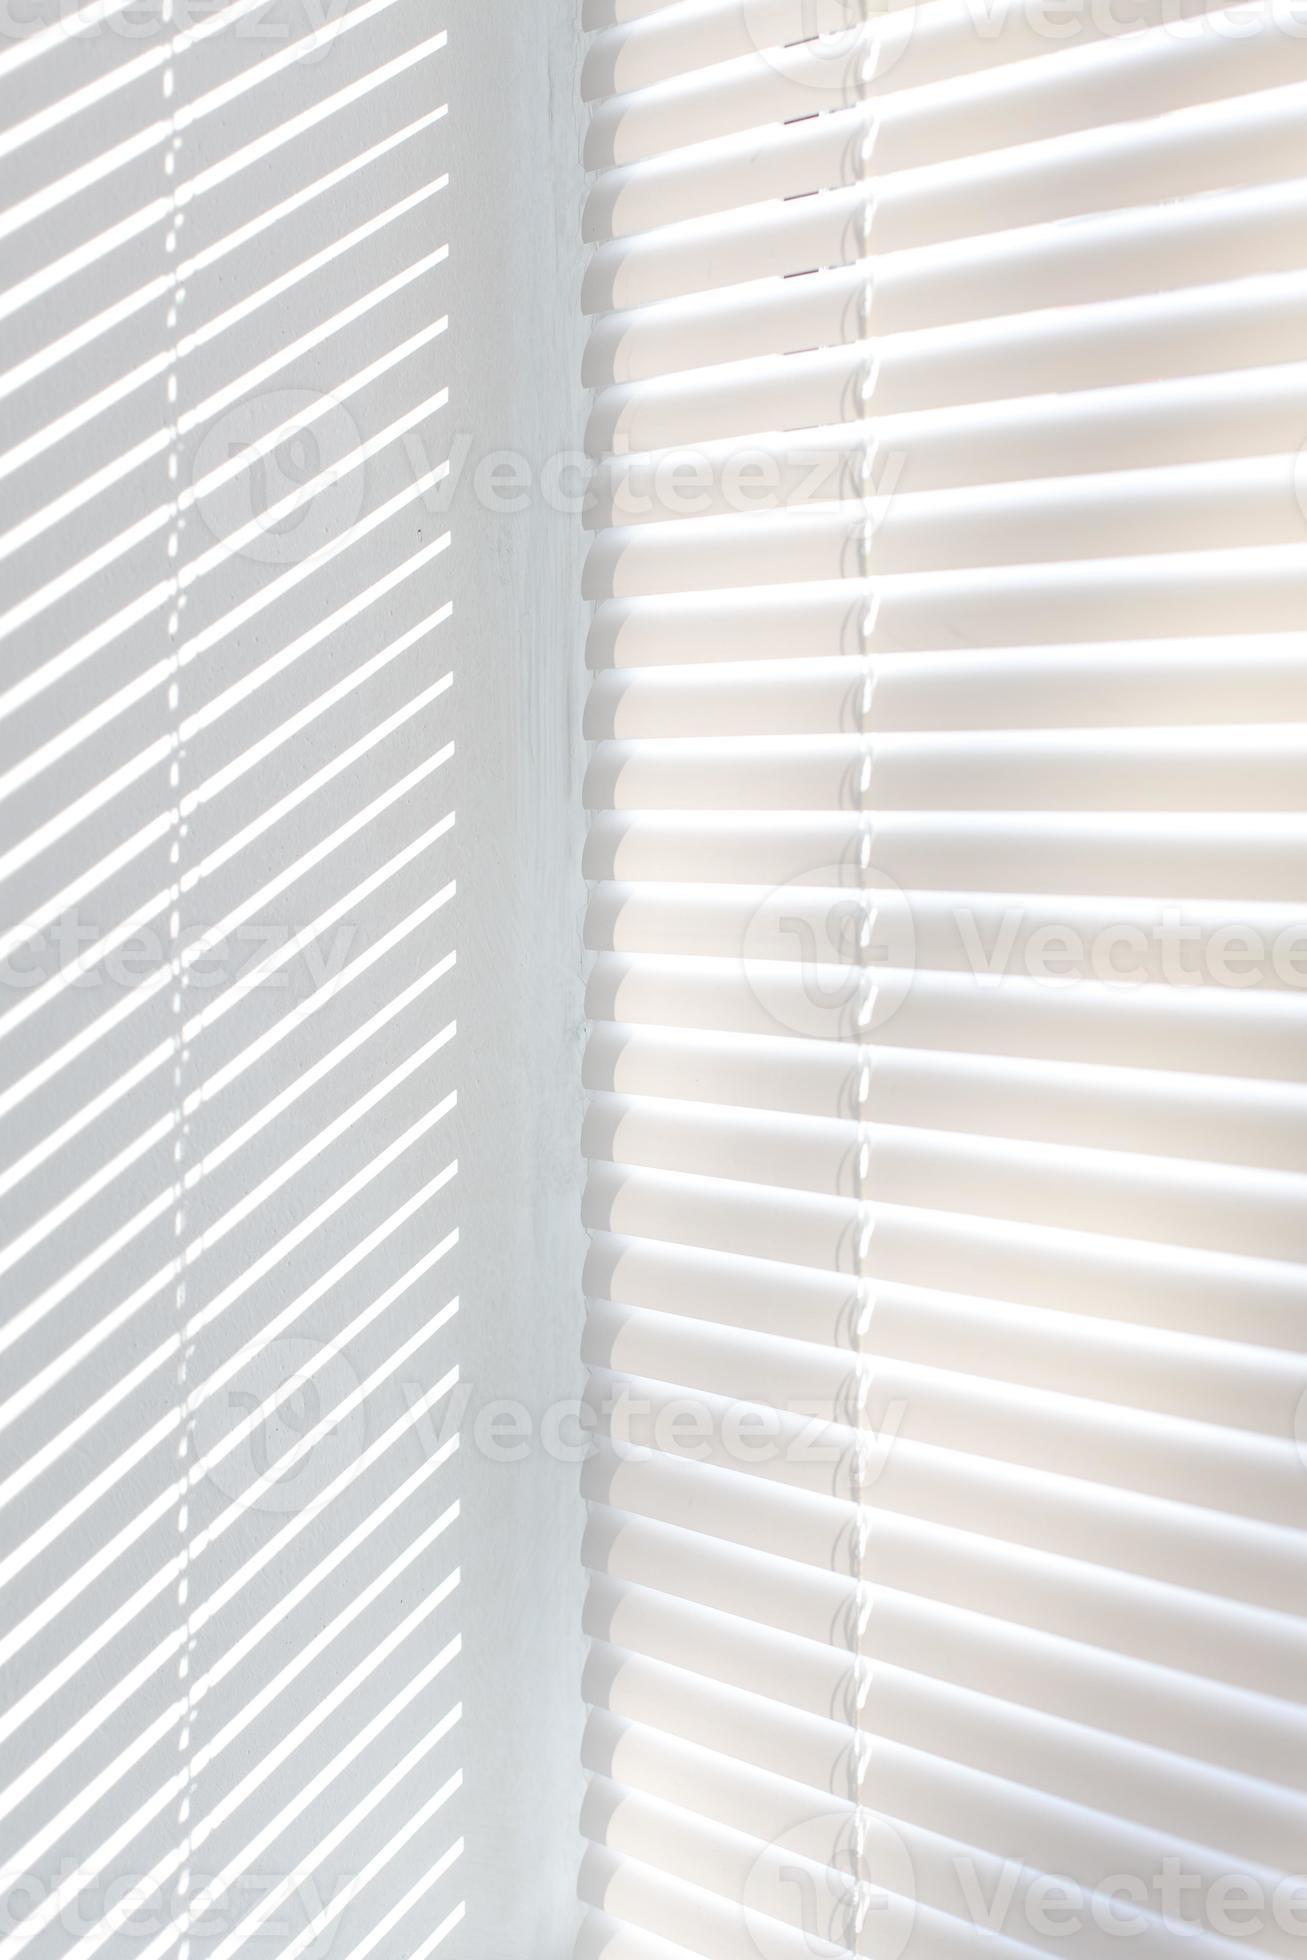 Venetian Blinds Background With Sun Light Stock Photo